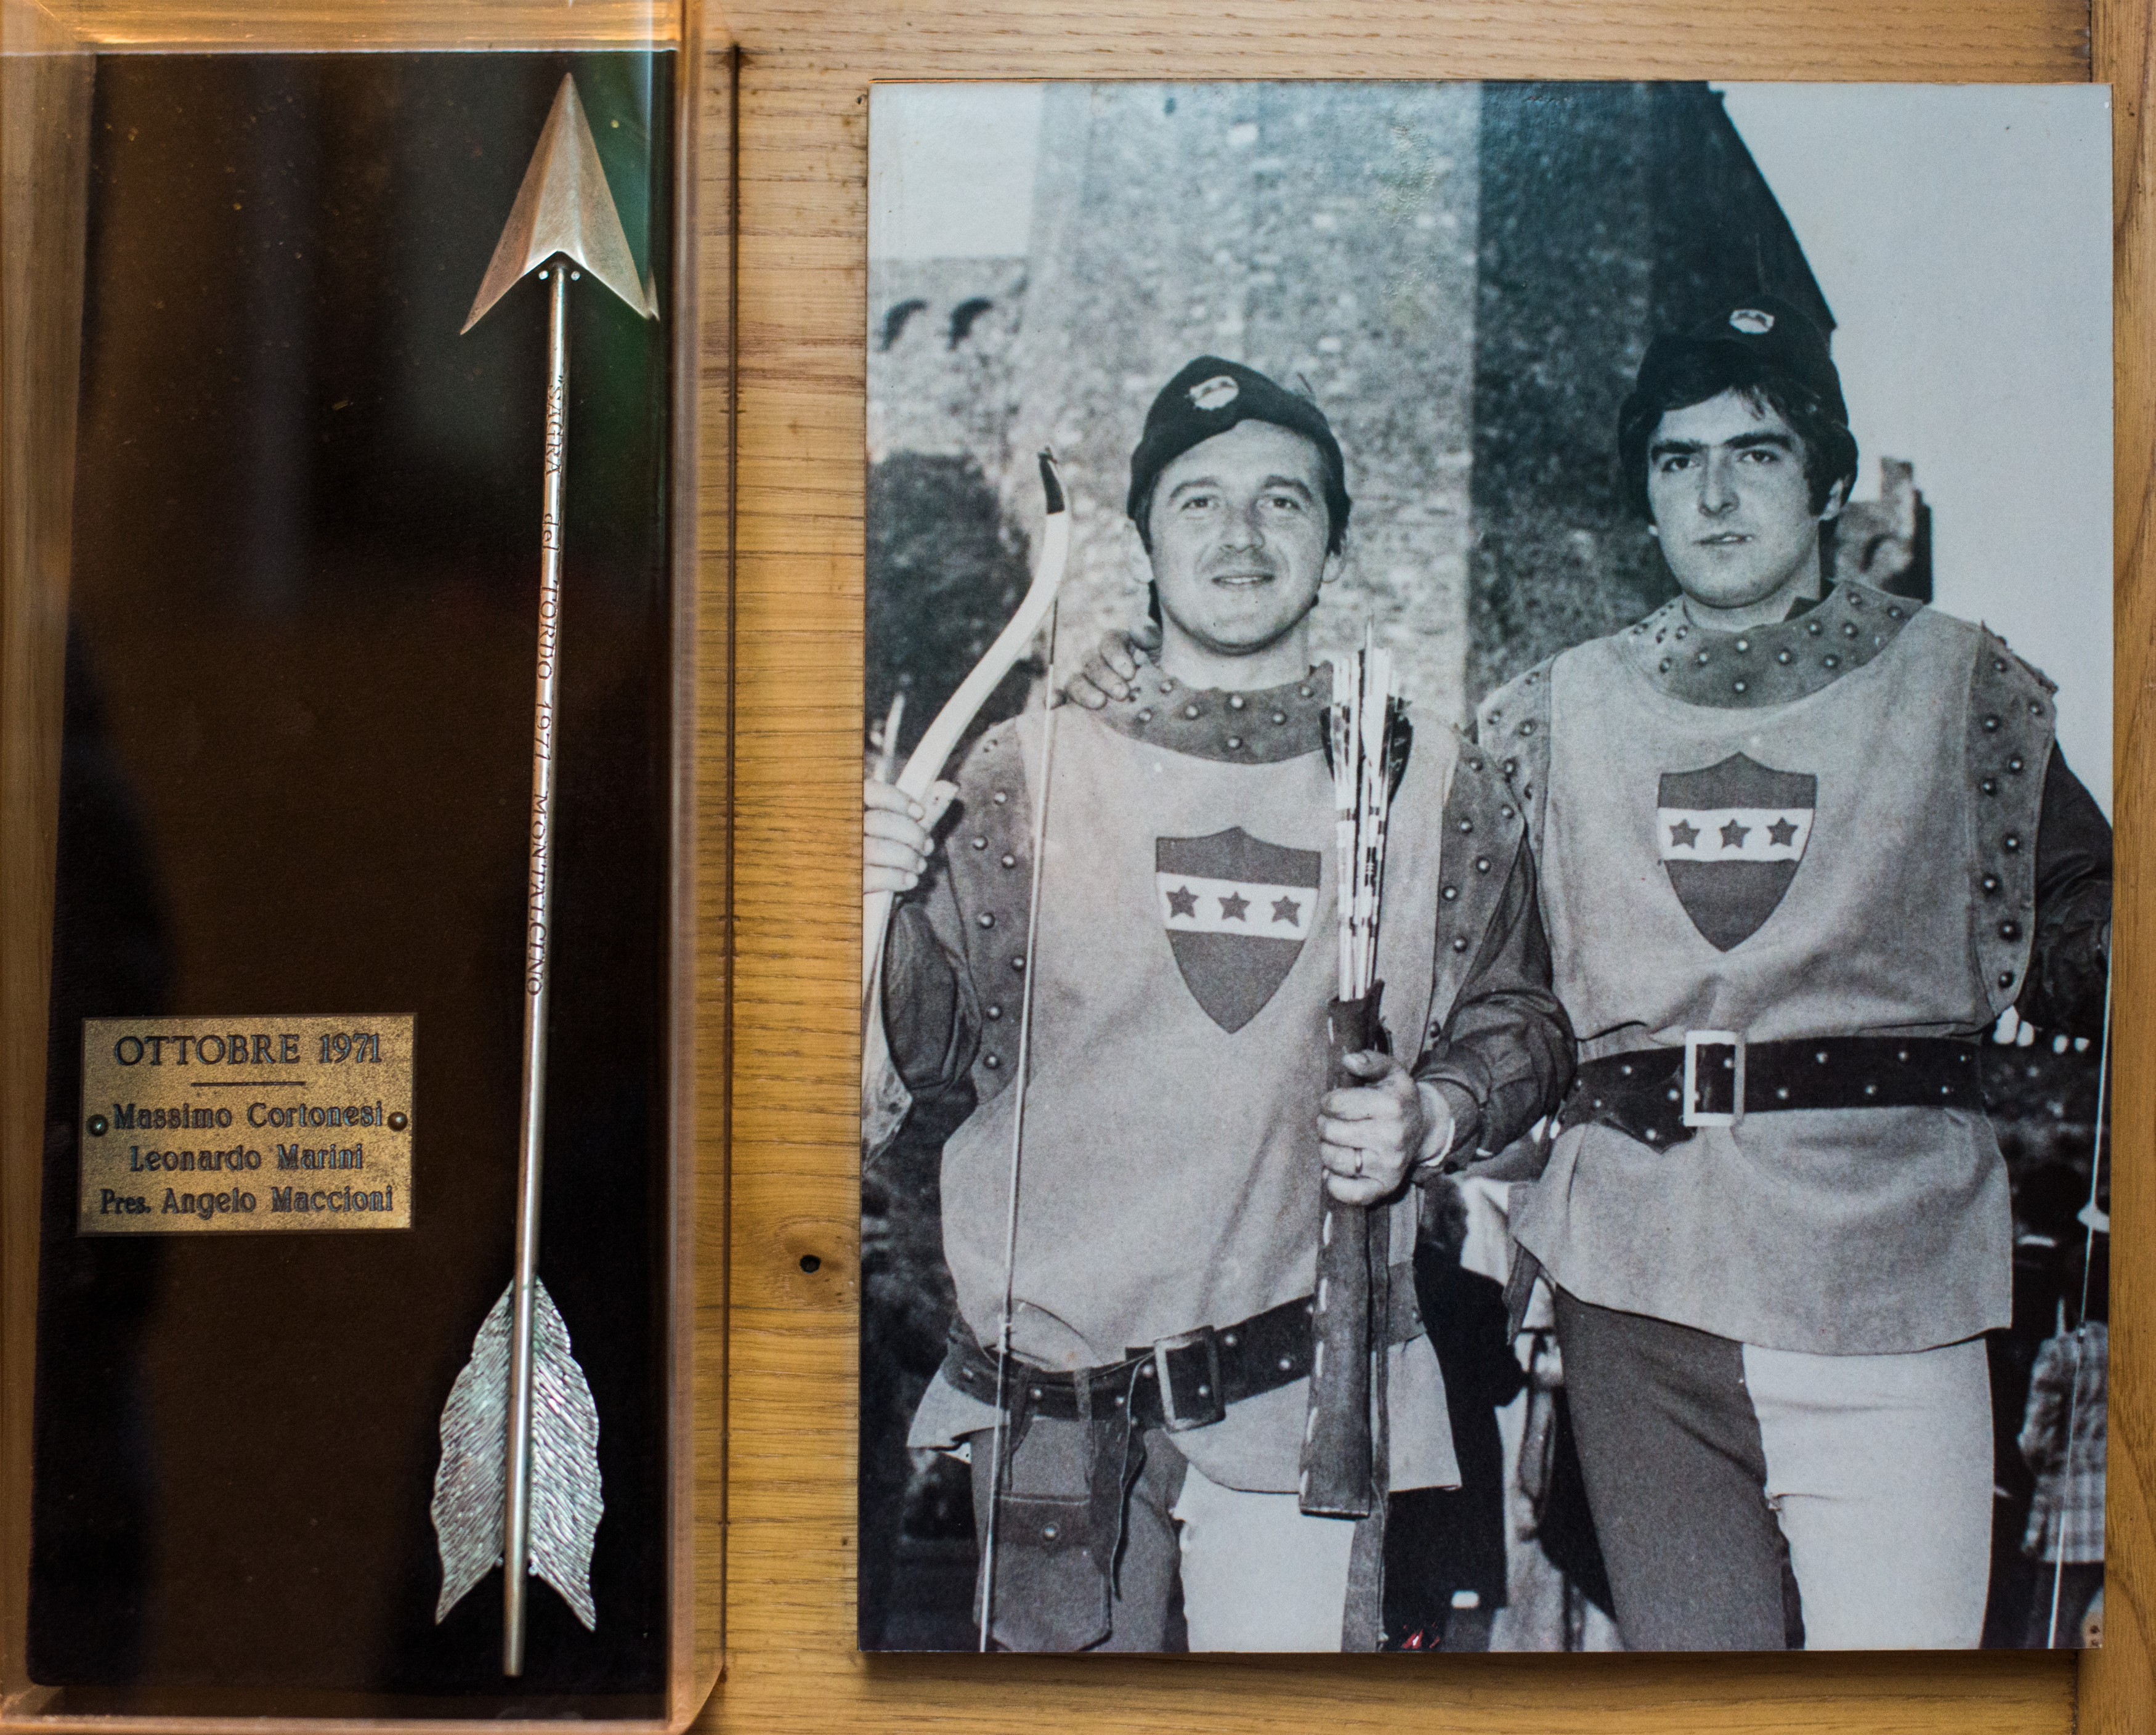 I - Ottobre 1971, Arcieri: Massimo Cortonesi e Marini Leonardo, Presidente: Angelo Maccioni